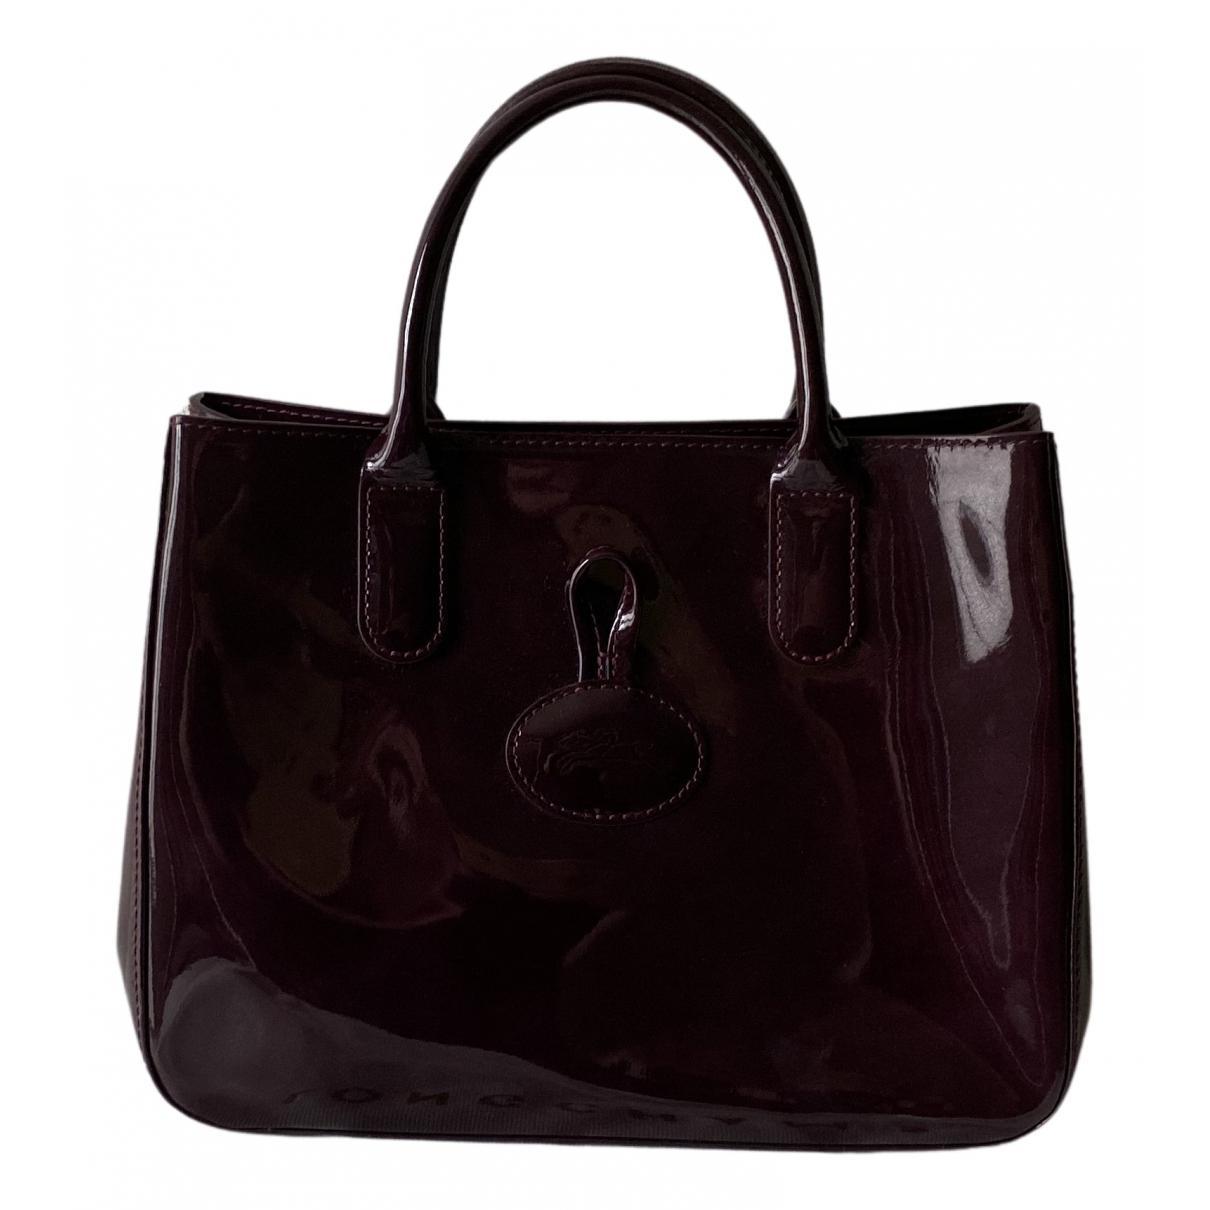 Longchamp Roseau Purple Patent leather handbag for Women N